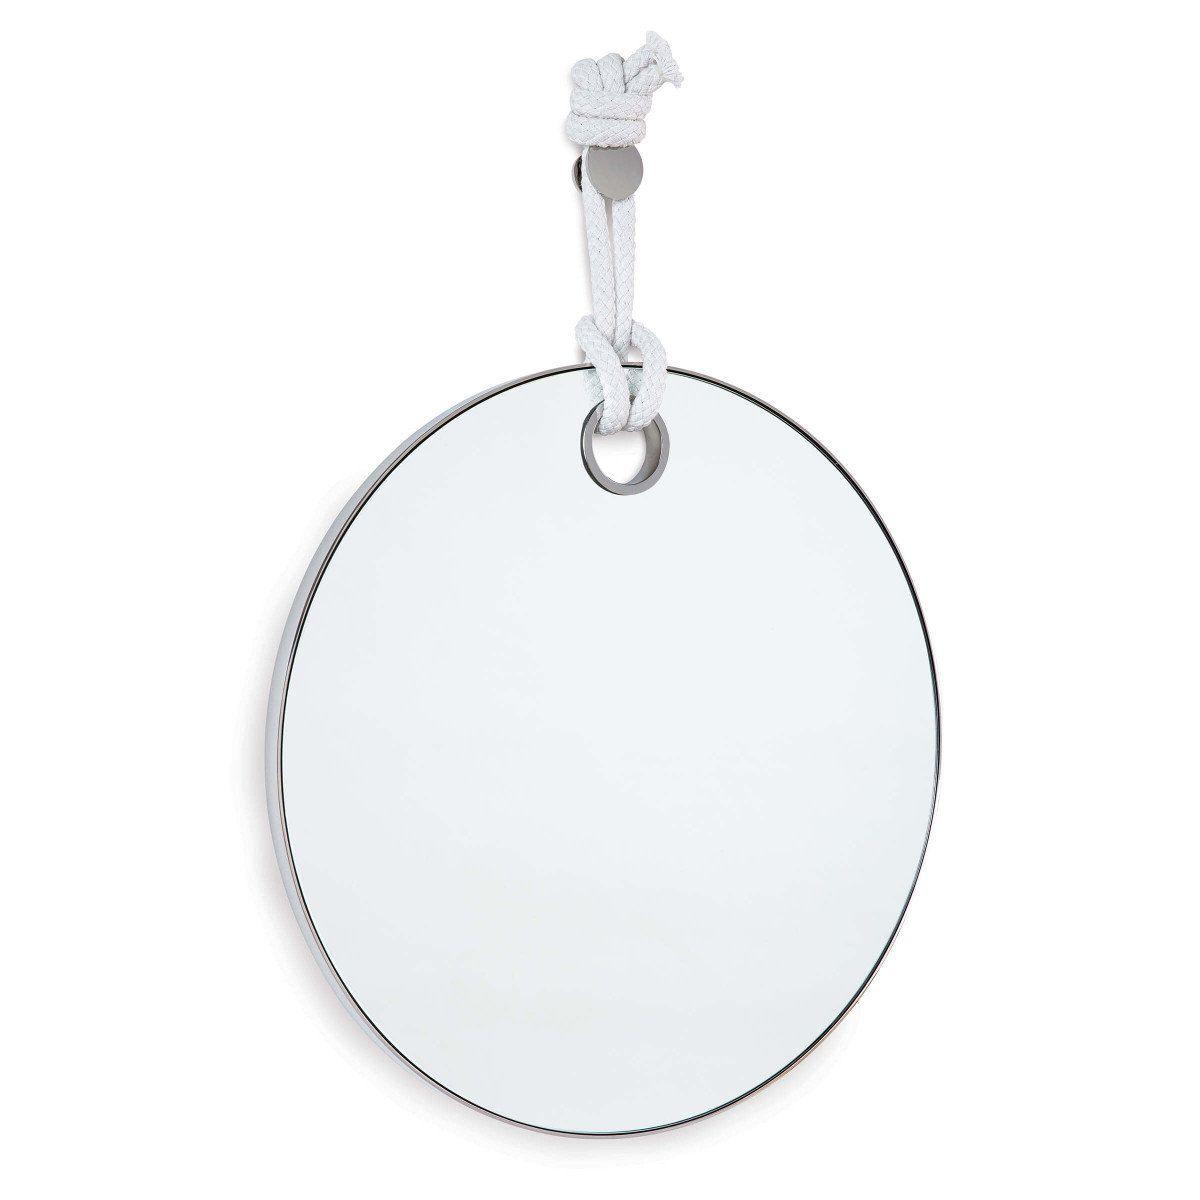 Marina Wall Mirror